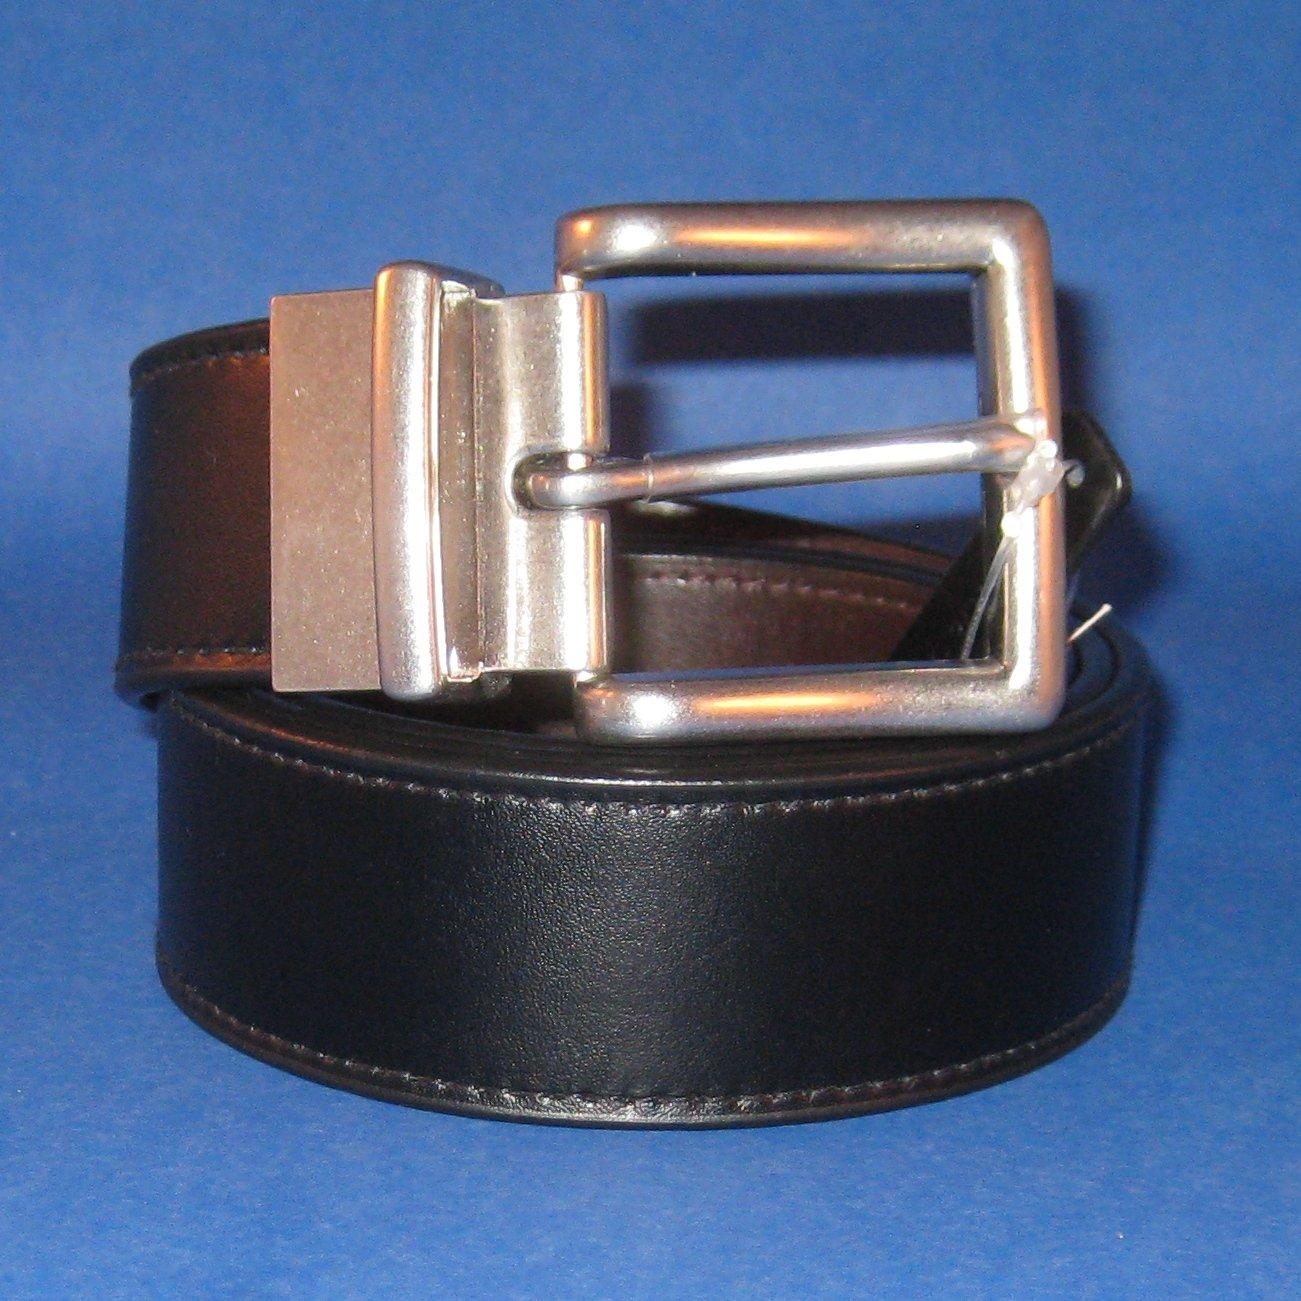 NWT Polo Ralph Lauren Men's Black/Brown Reversible Wide Leather Belt - 40